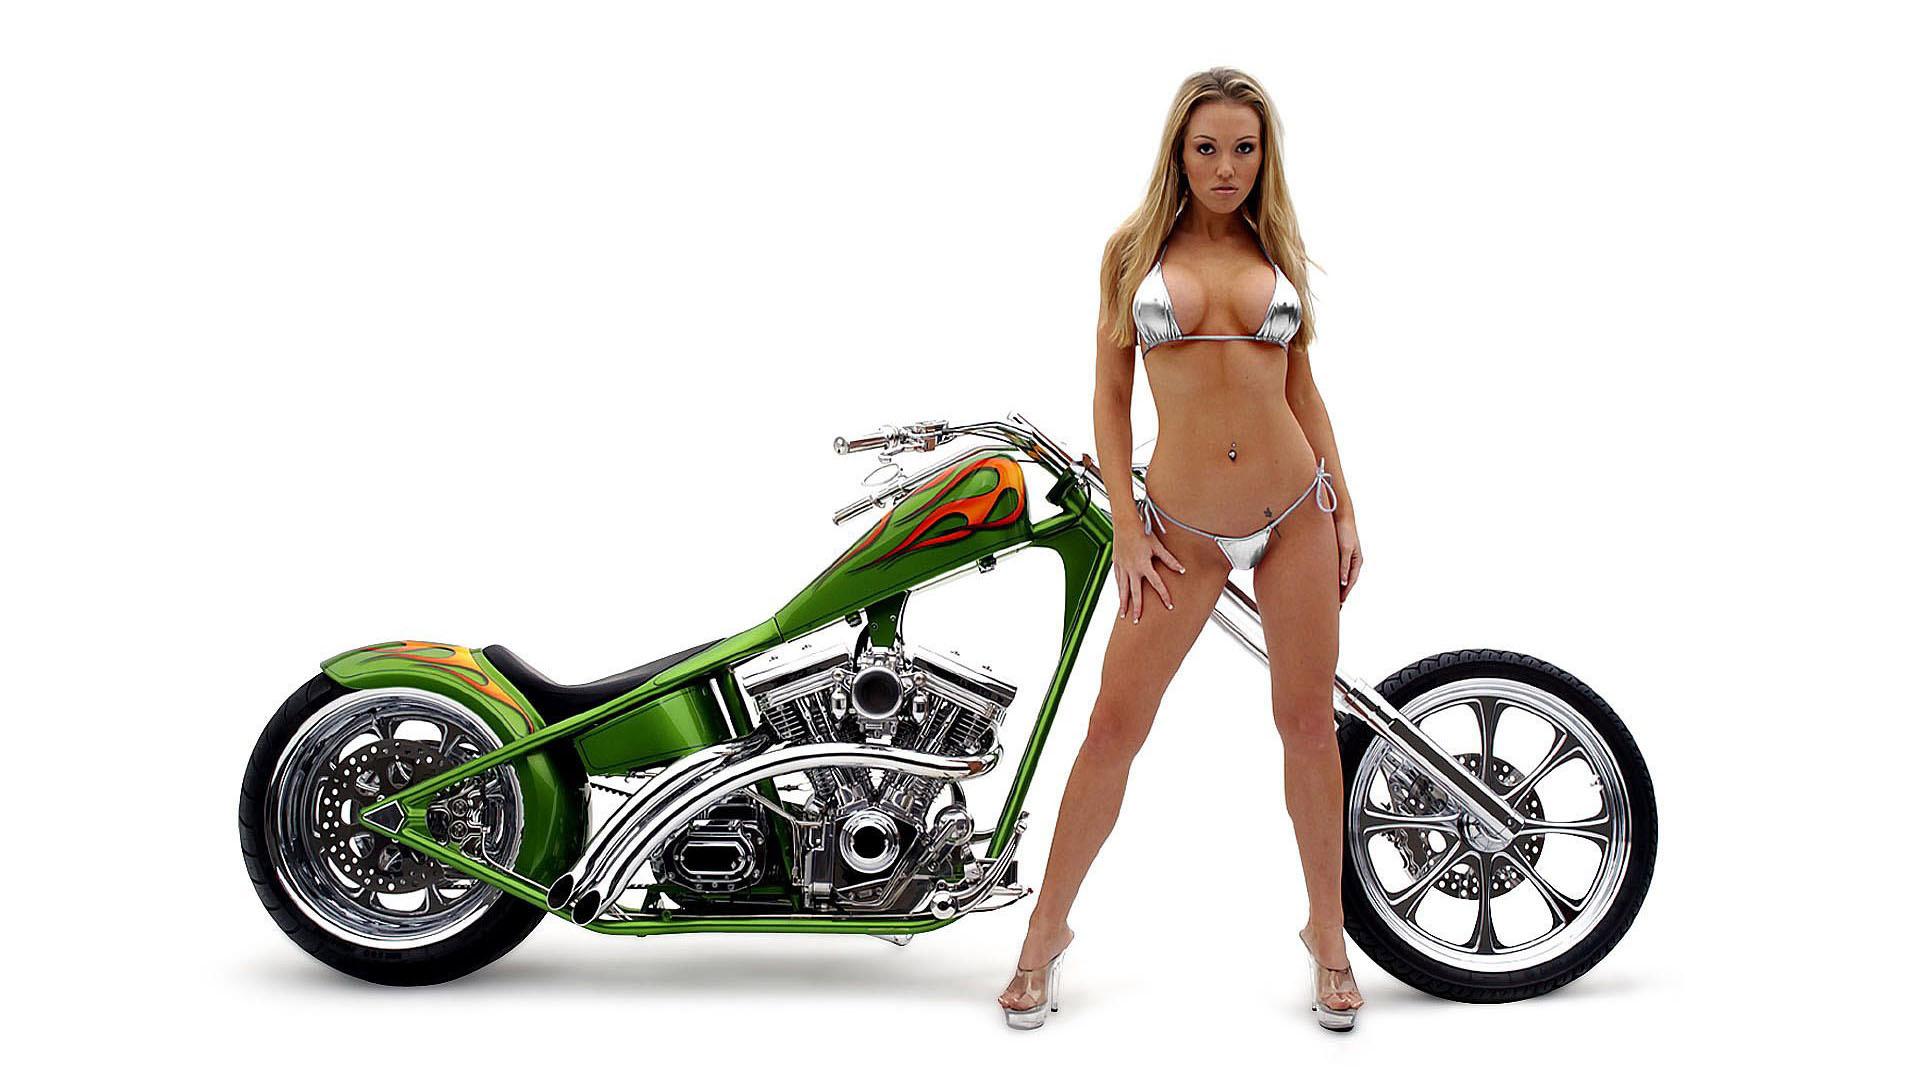 wallpaper Bikini motorcycle